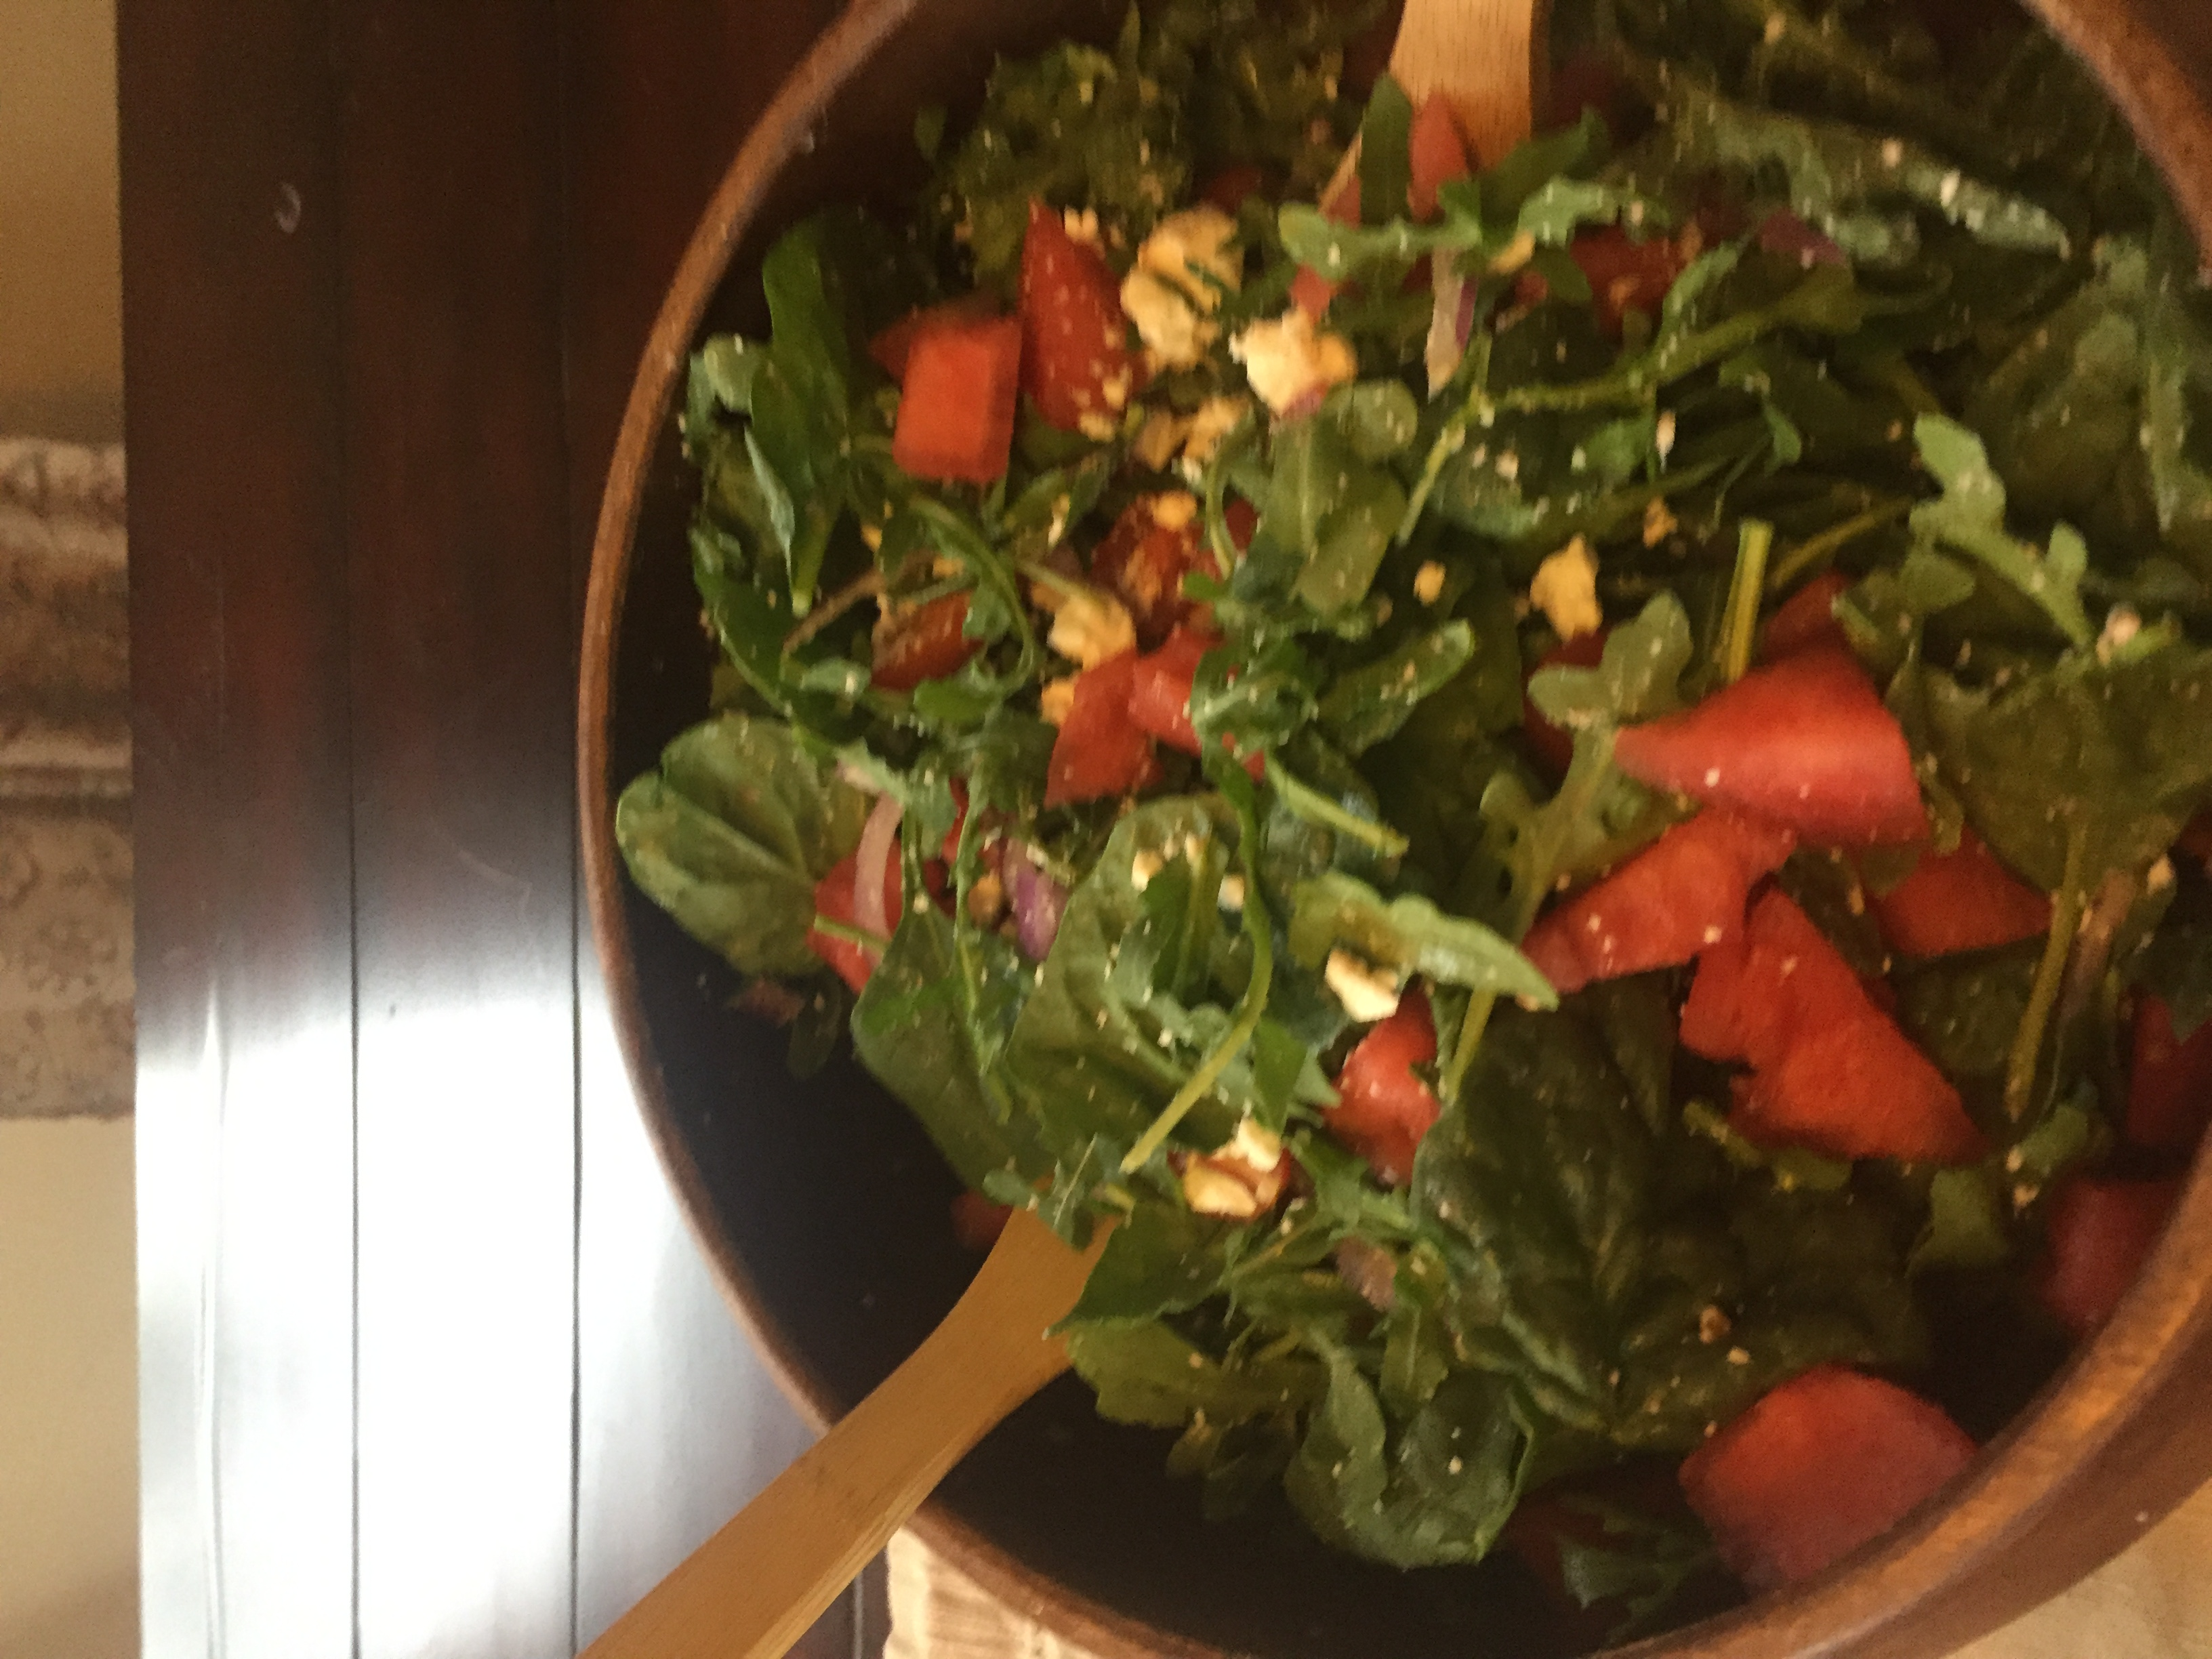 Watermelon and Feta Salad with Arugula and Spinach Chris Gaeta